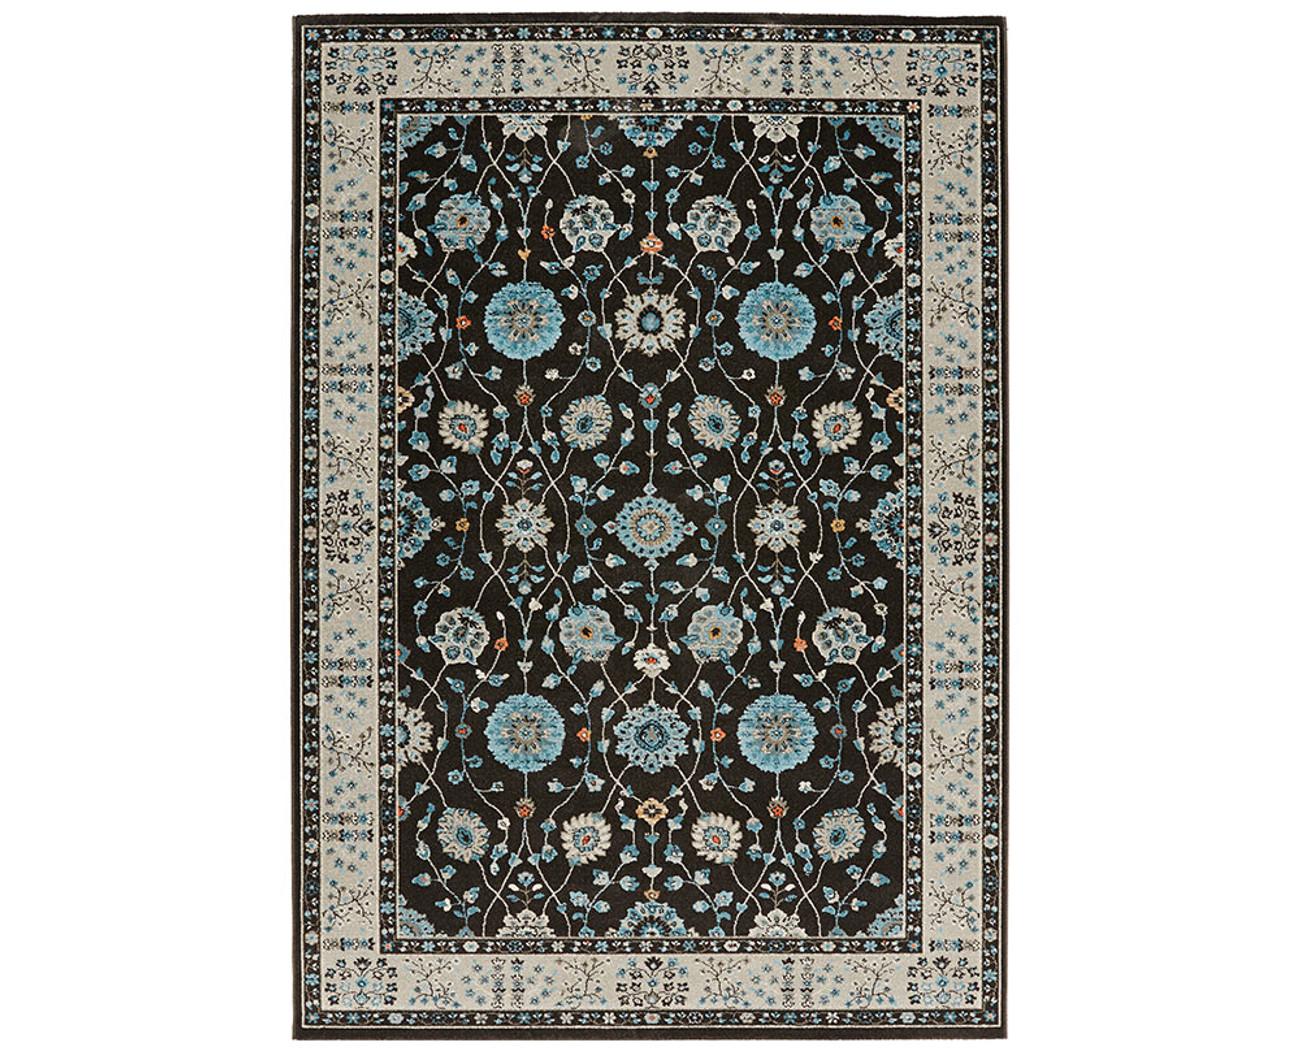 design velours teppich couture anthrazit blau grau. Black Bedroom Furniture Sets. Home Design Ideas